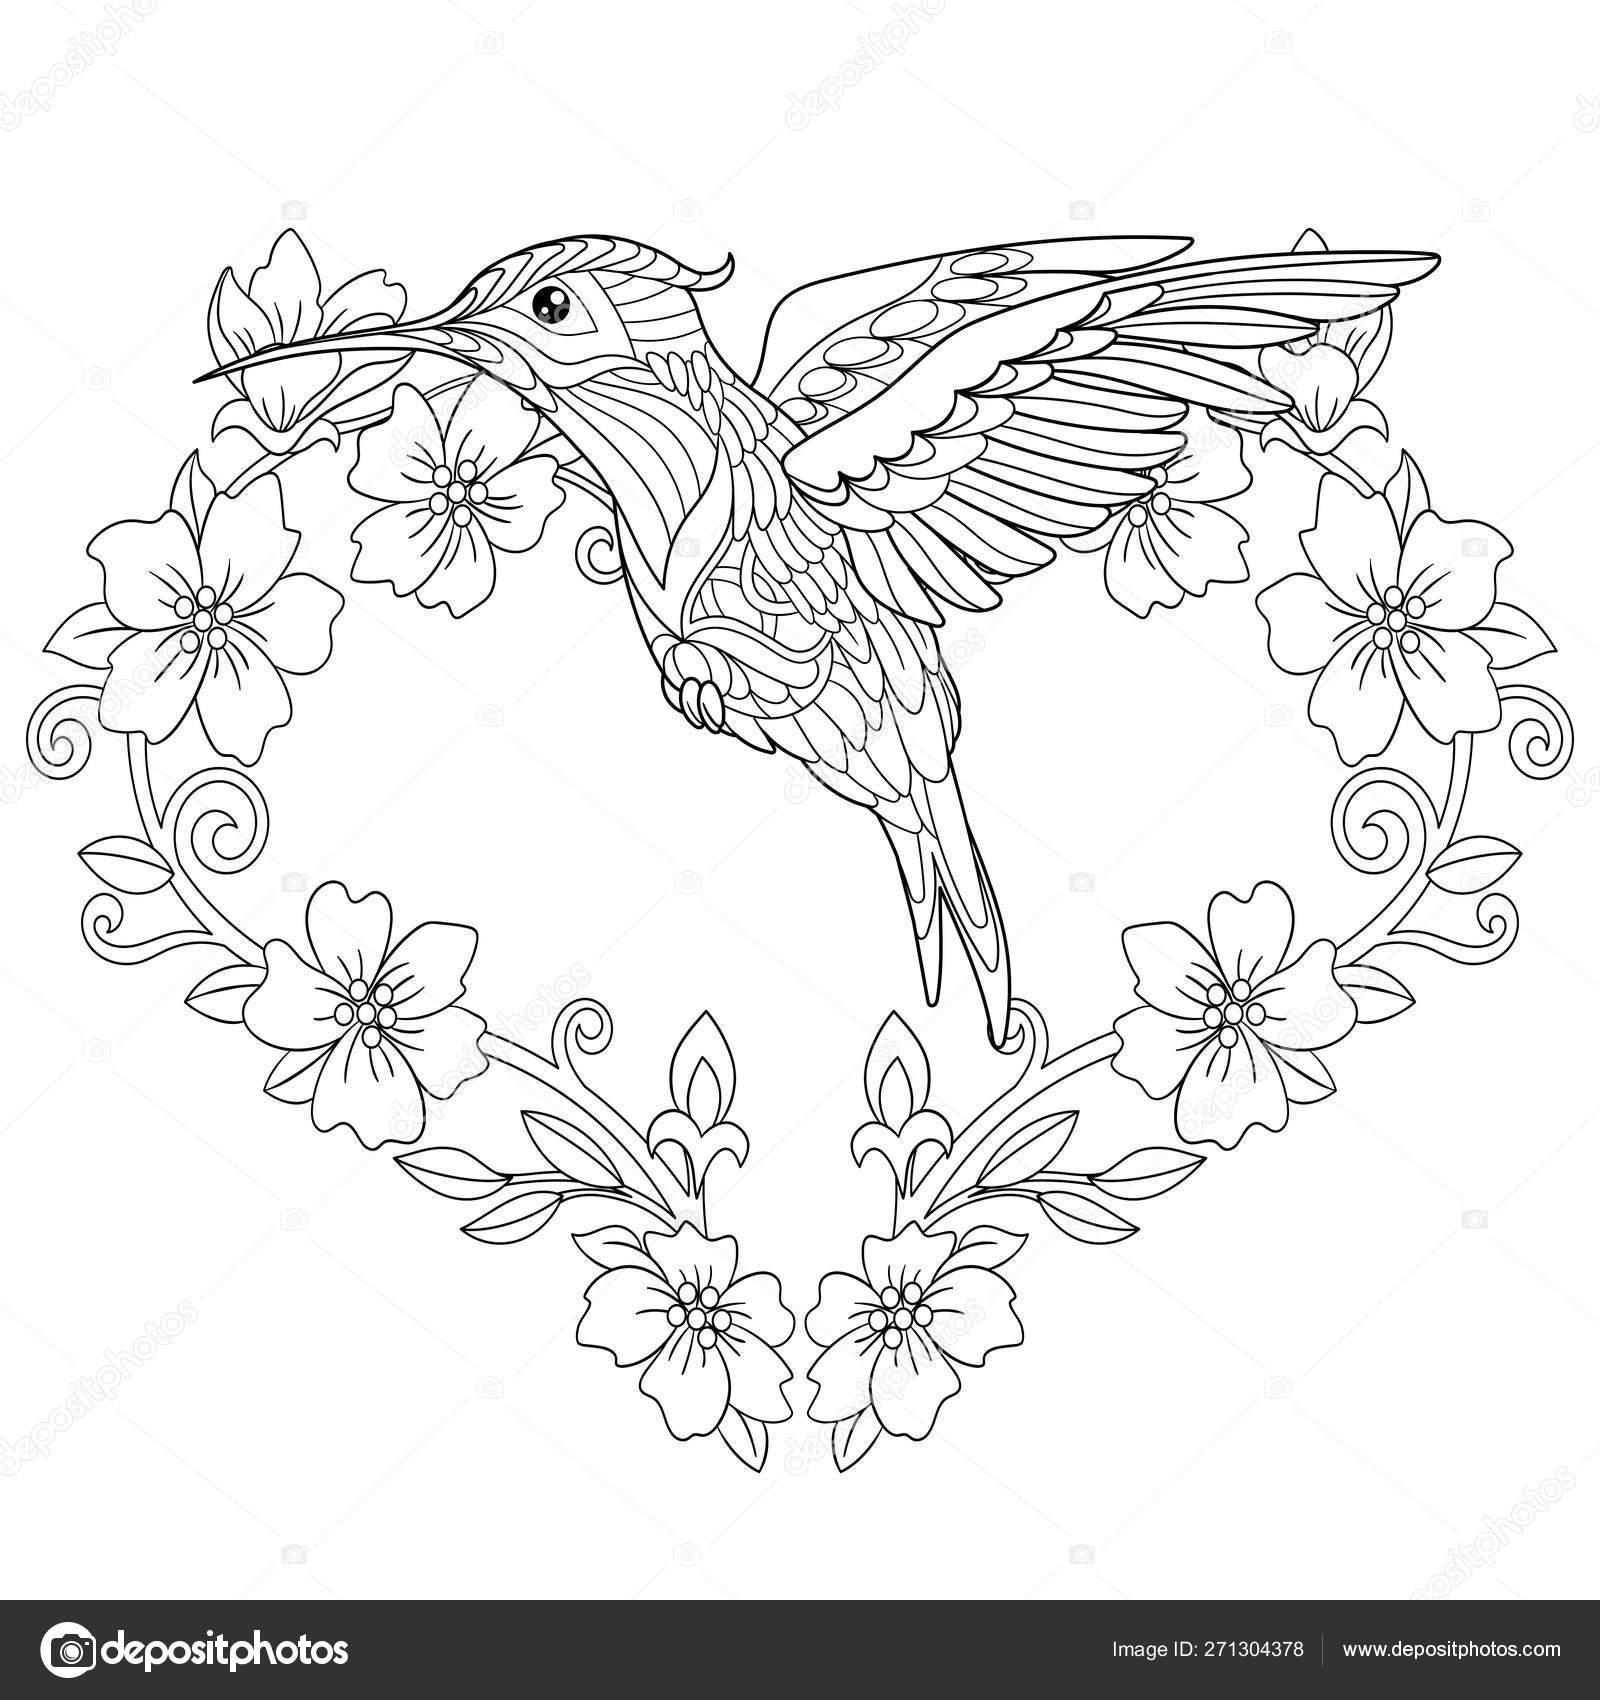 Zentangle hummingbird coloring page — Stock Vector © Sybirko ...